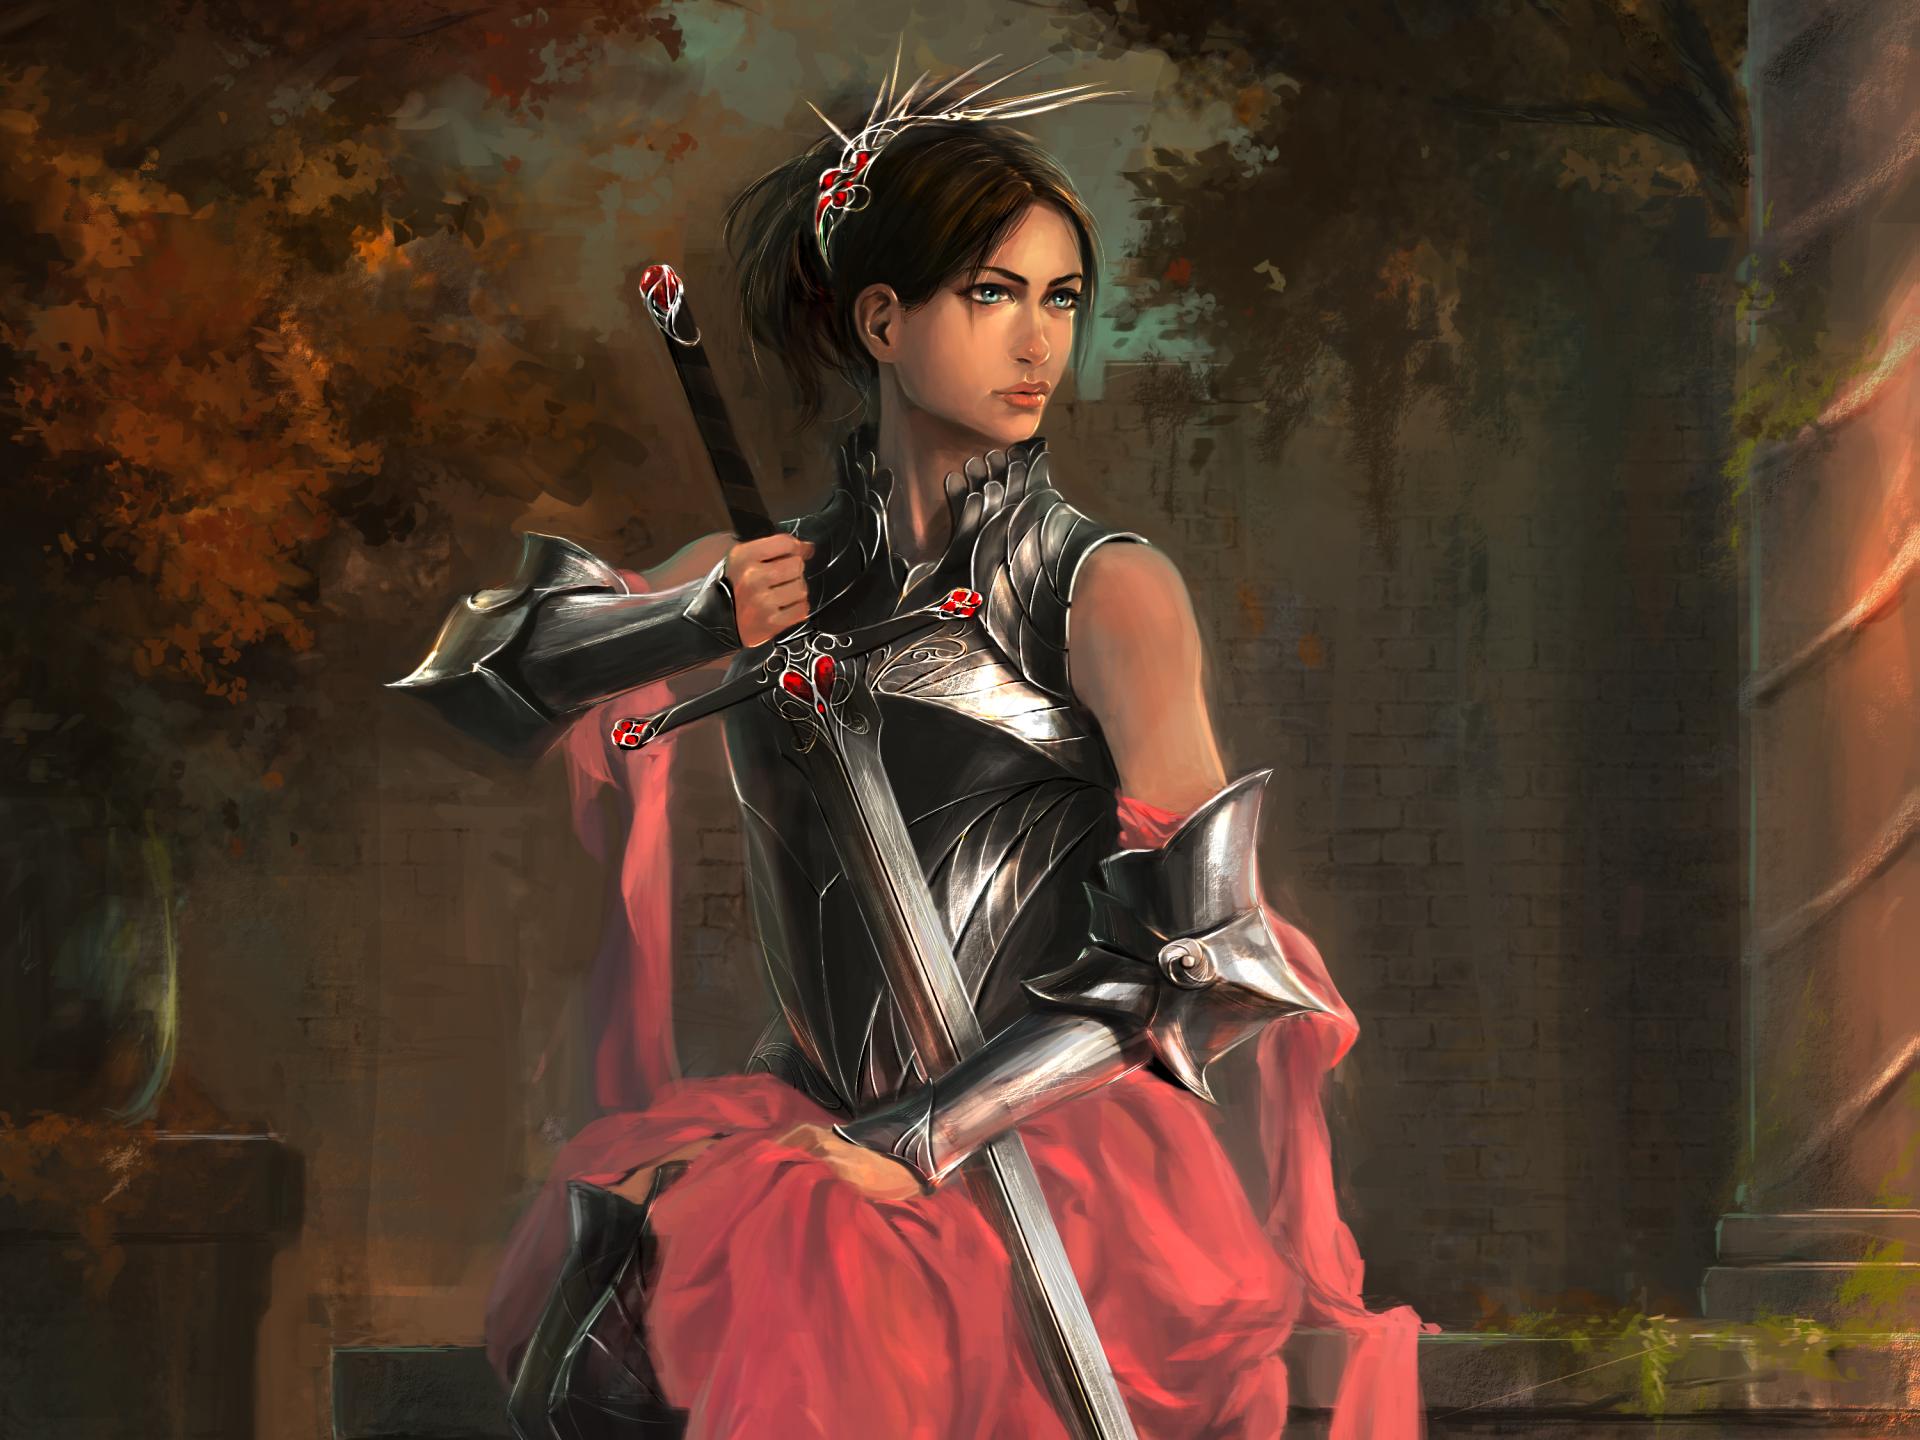 Women Warrior HD Wallpaper | Background Image | 3000x2250 ...